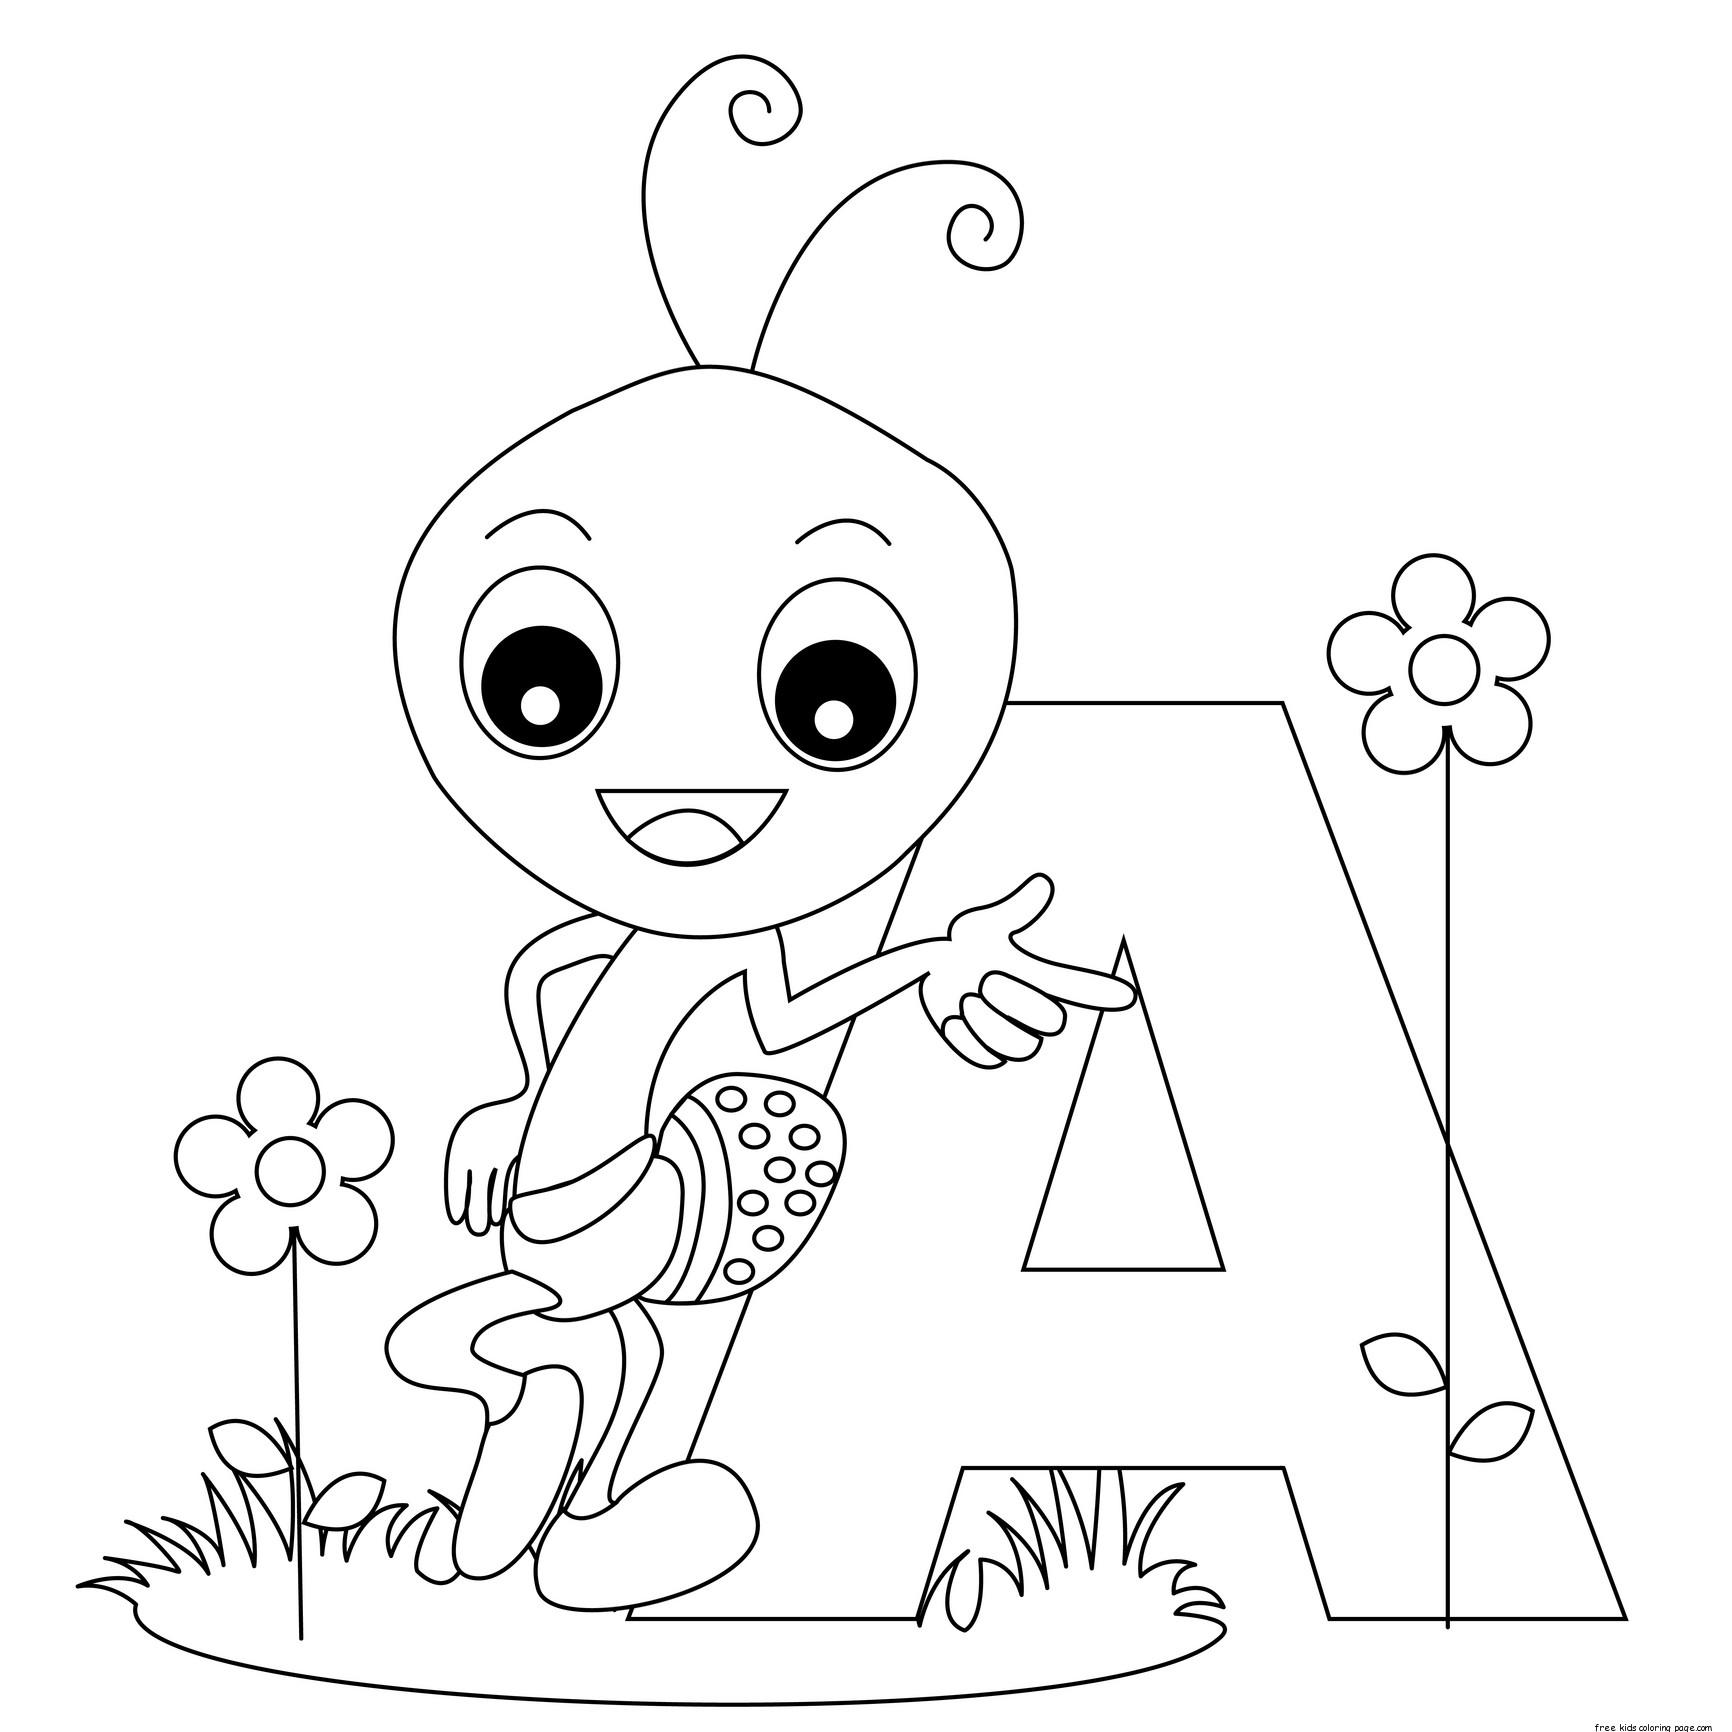 Free Alphabet Letter Formation Worksheets For Kidsfree